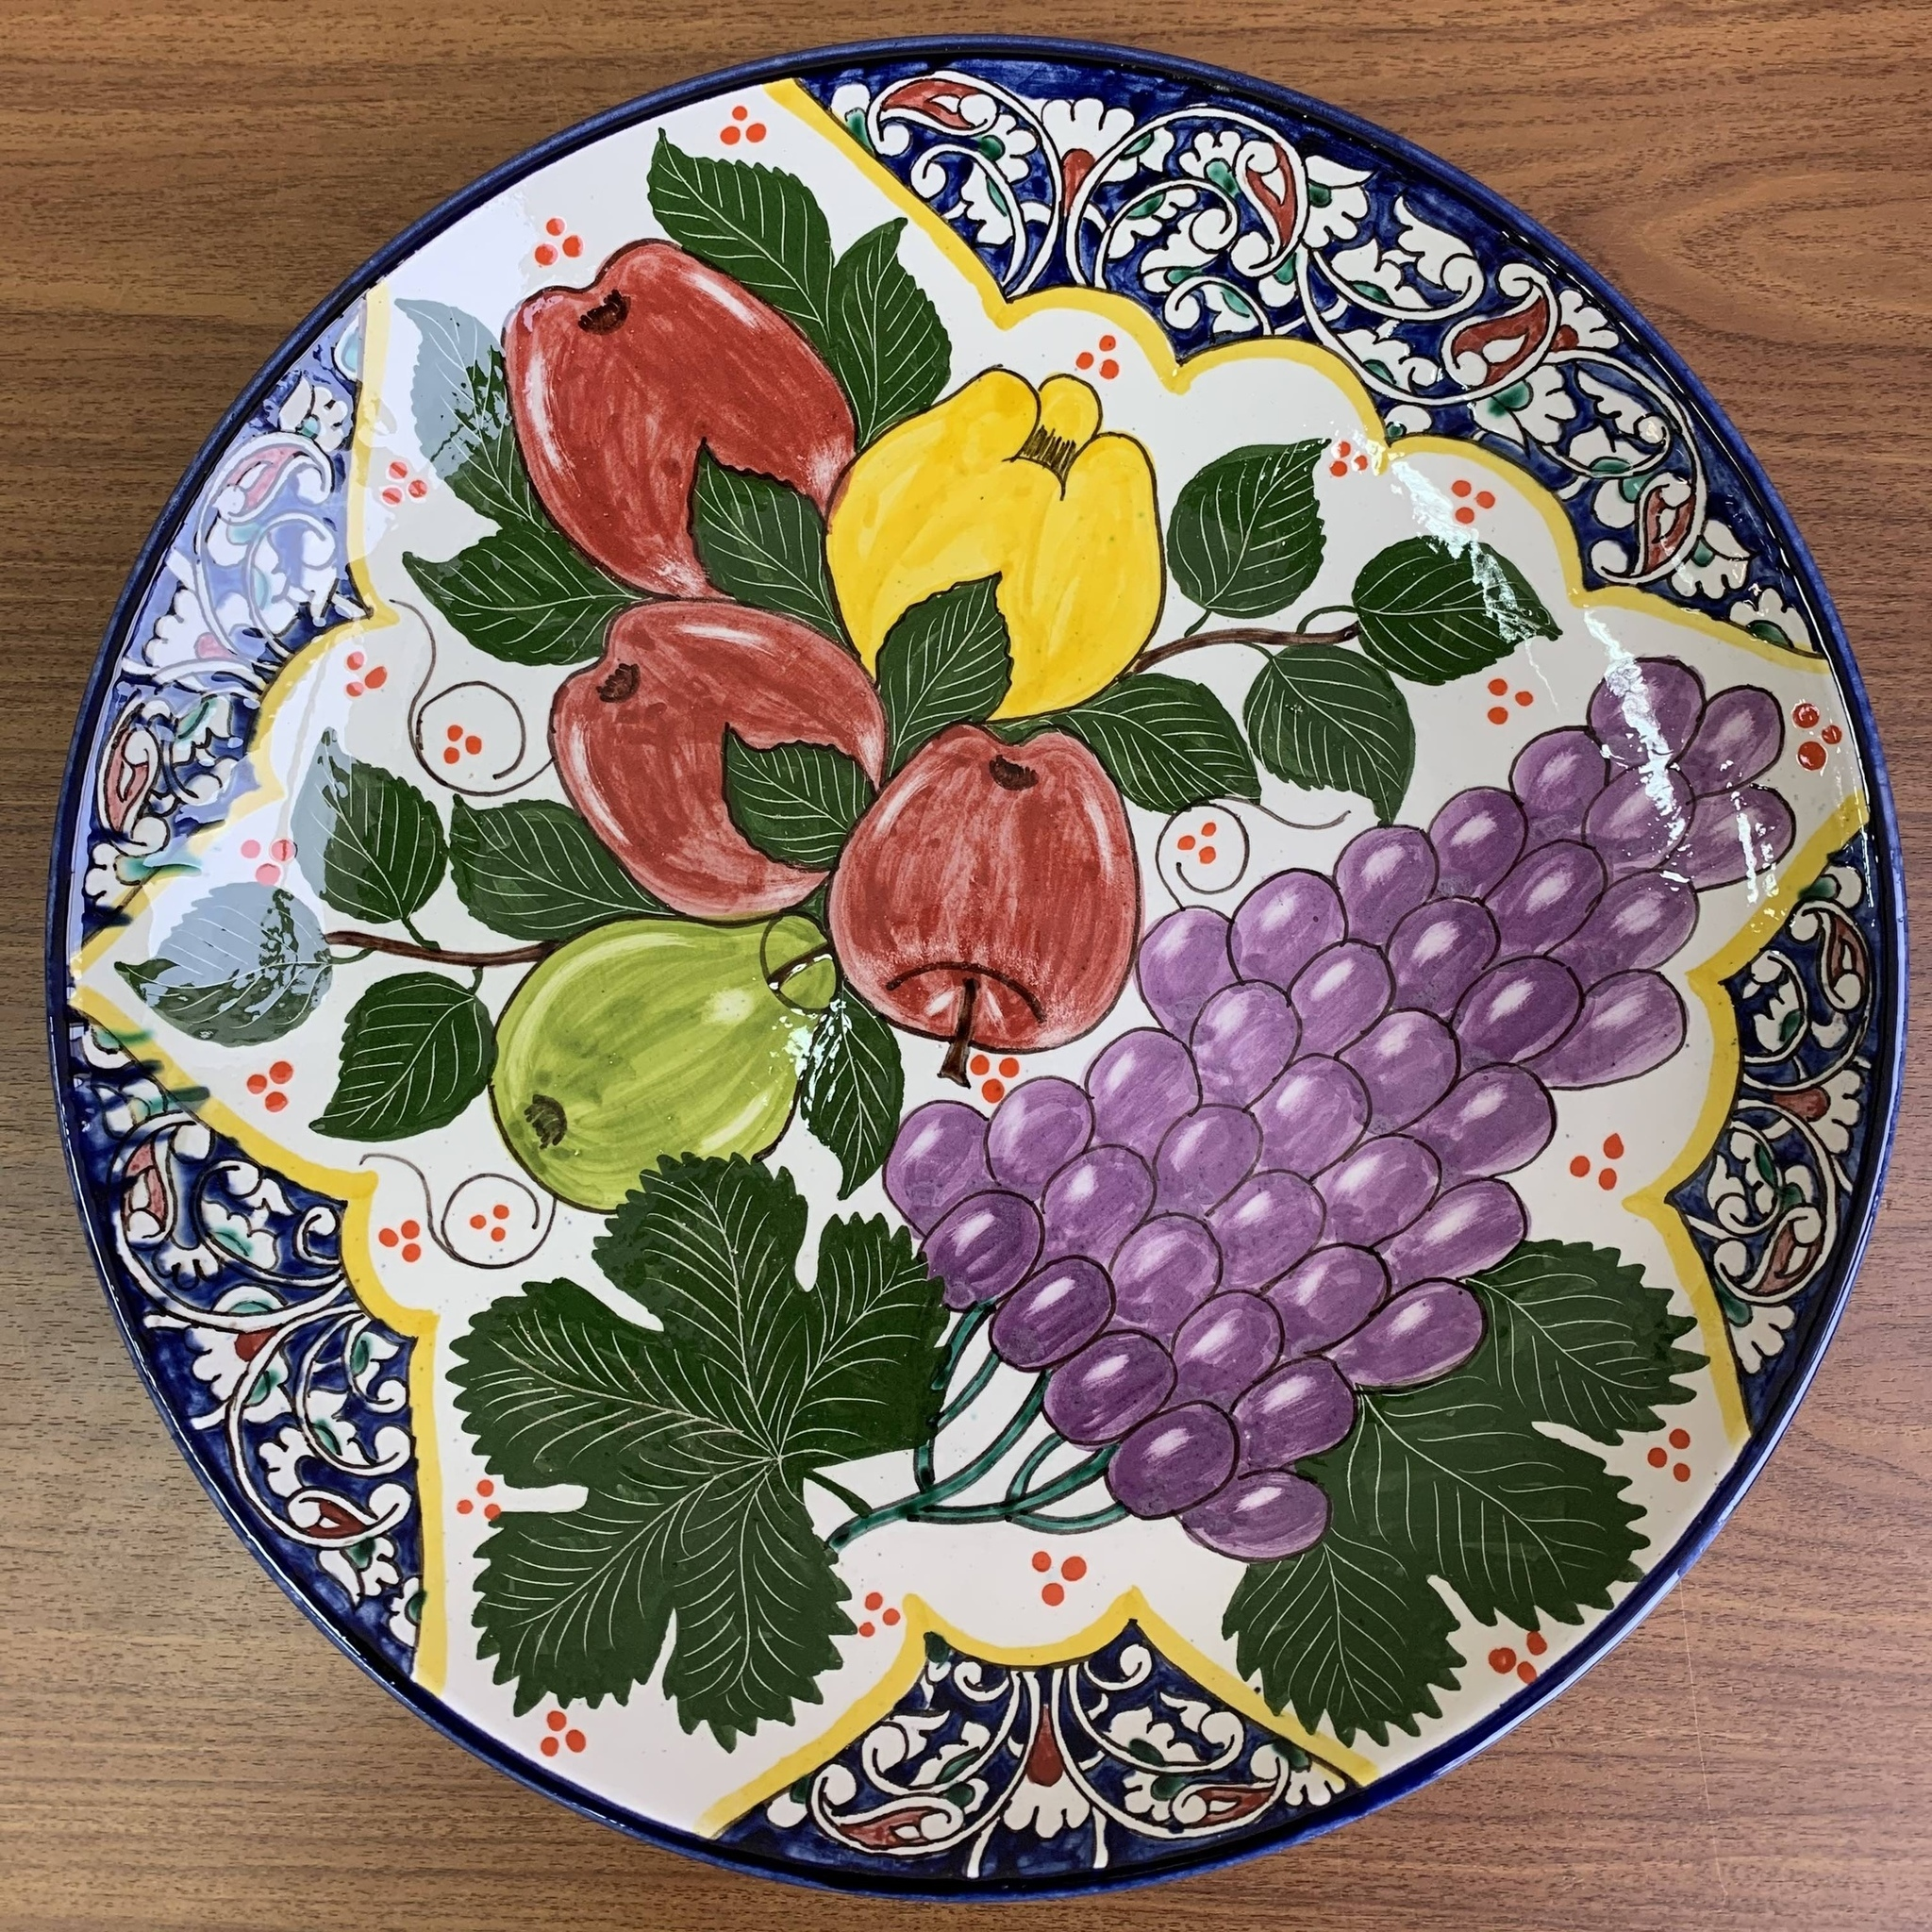 Посуда Ляган ручная роспись виноград 32 см vQMOTTJh1hw.jpg